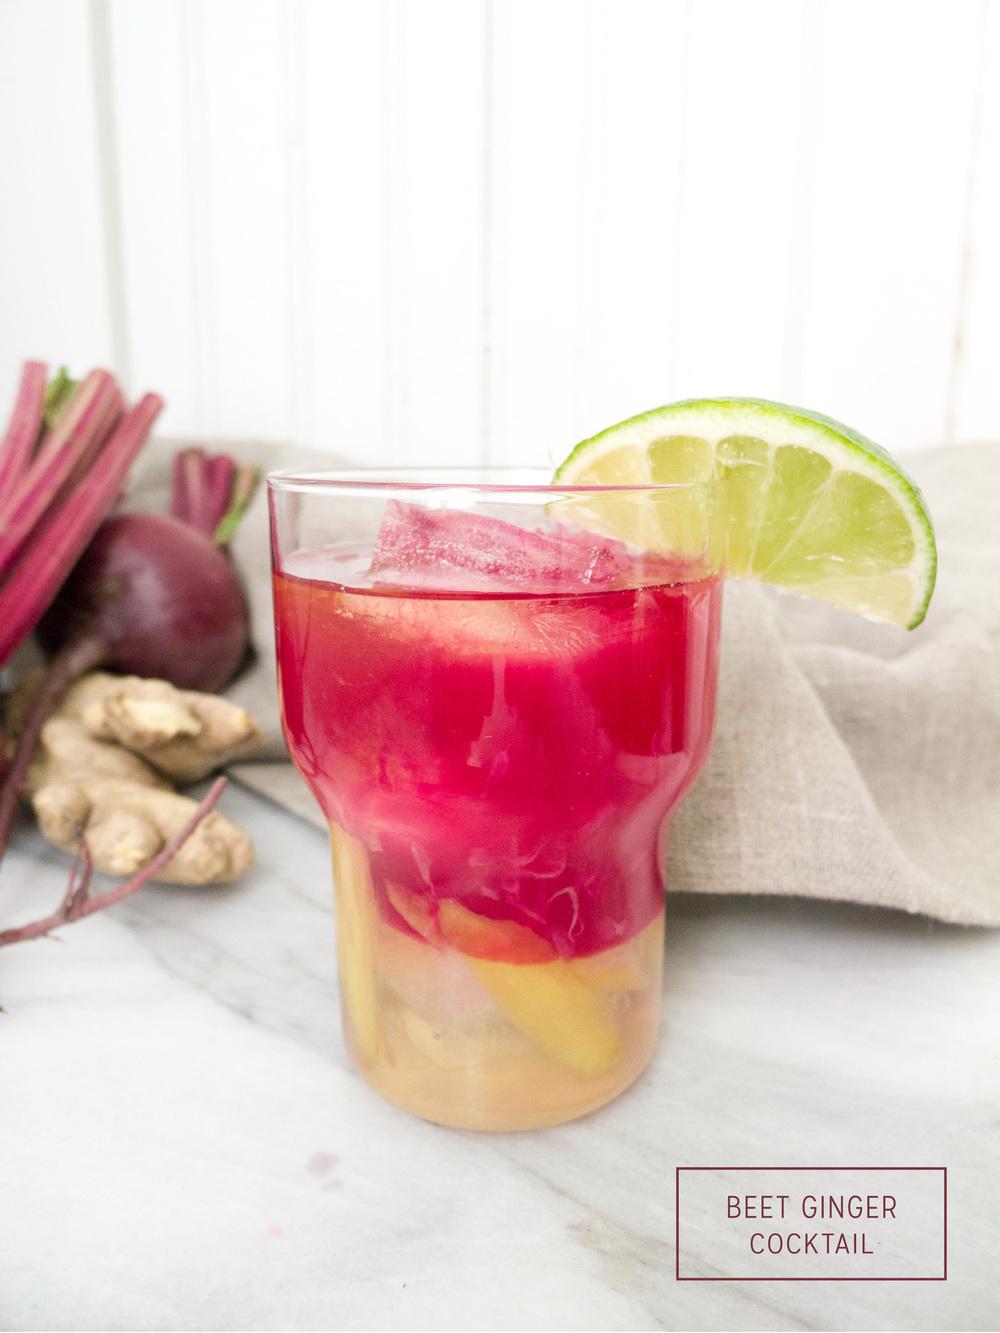 Healthier Cocktails: Beet Ginger